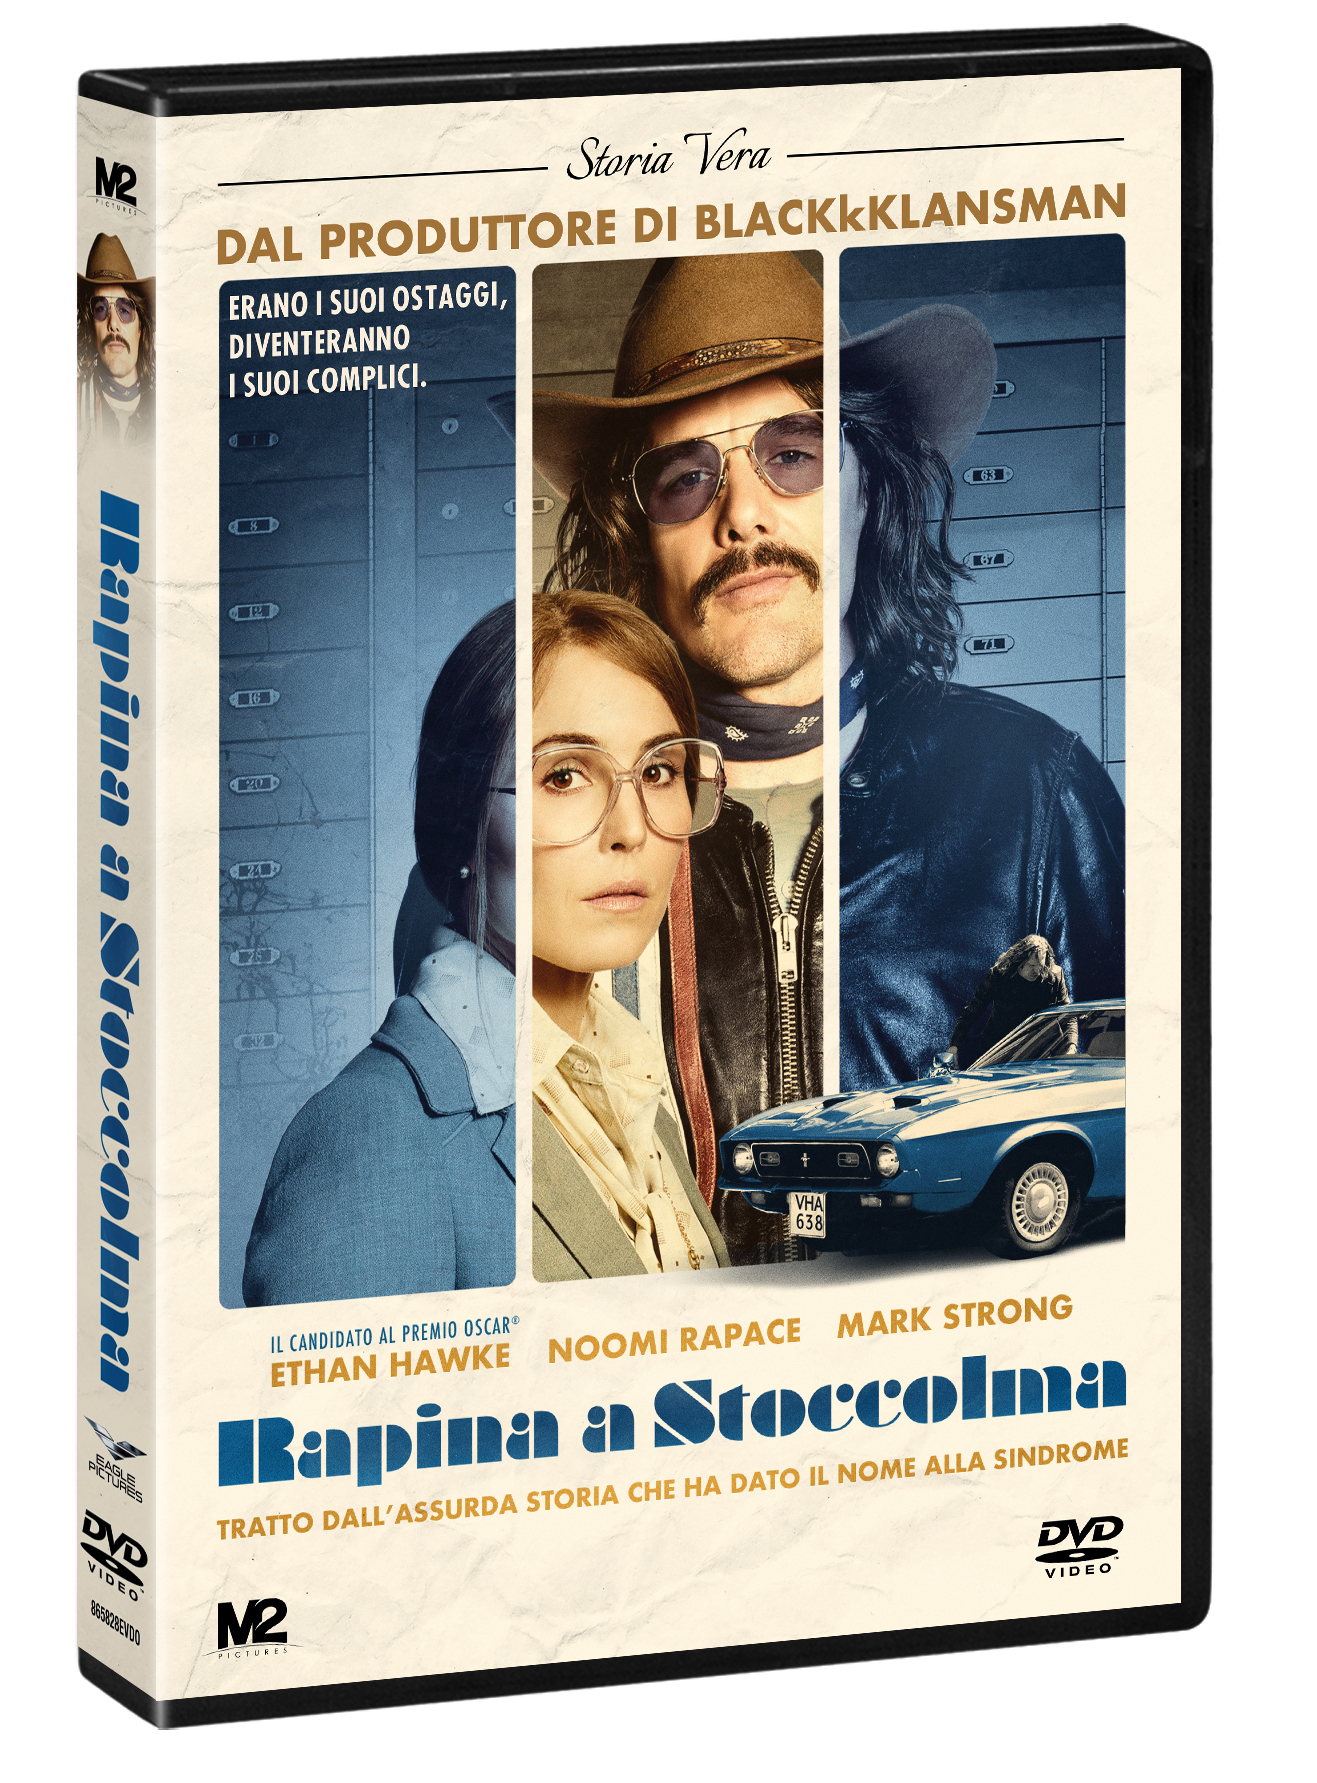 RAPINA A STOCCOLMA (DVD)